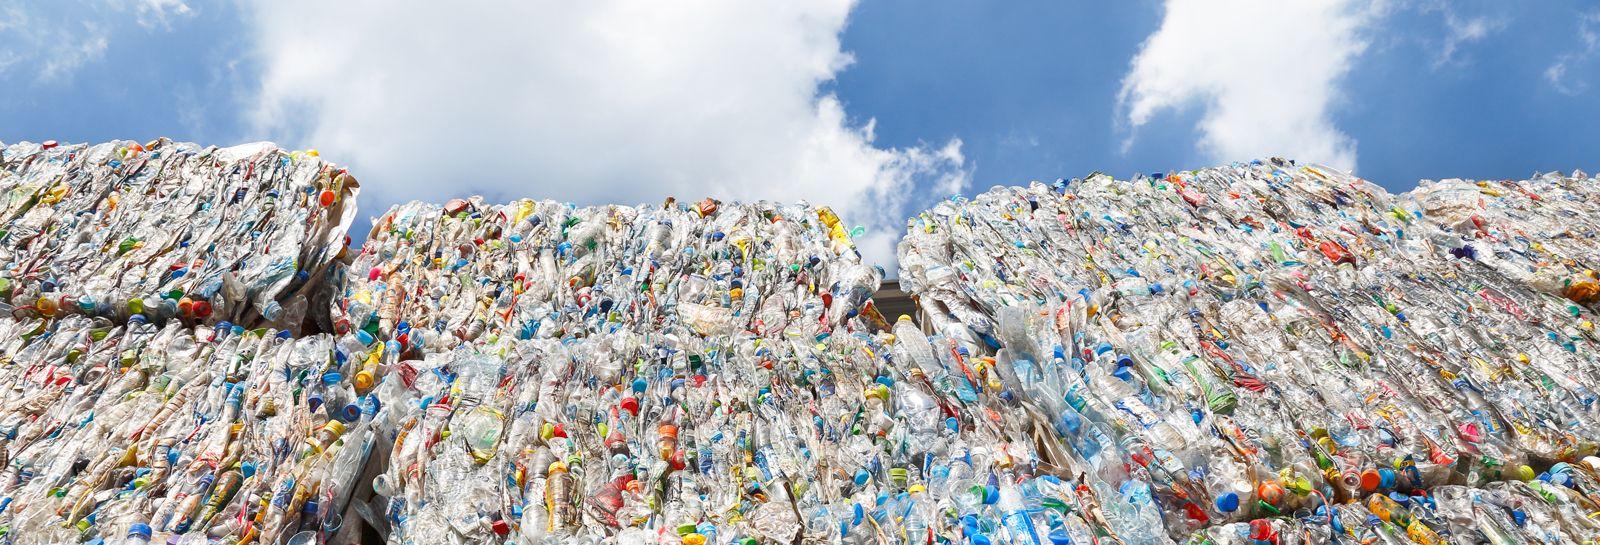 Waste minimisation banner image